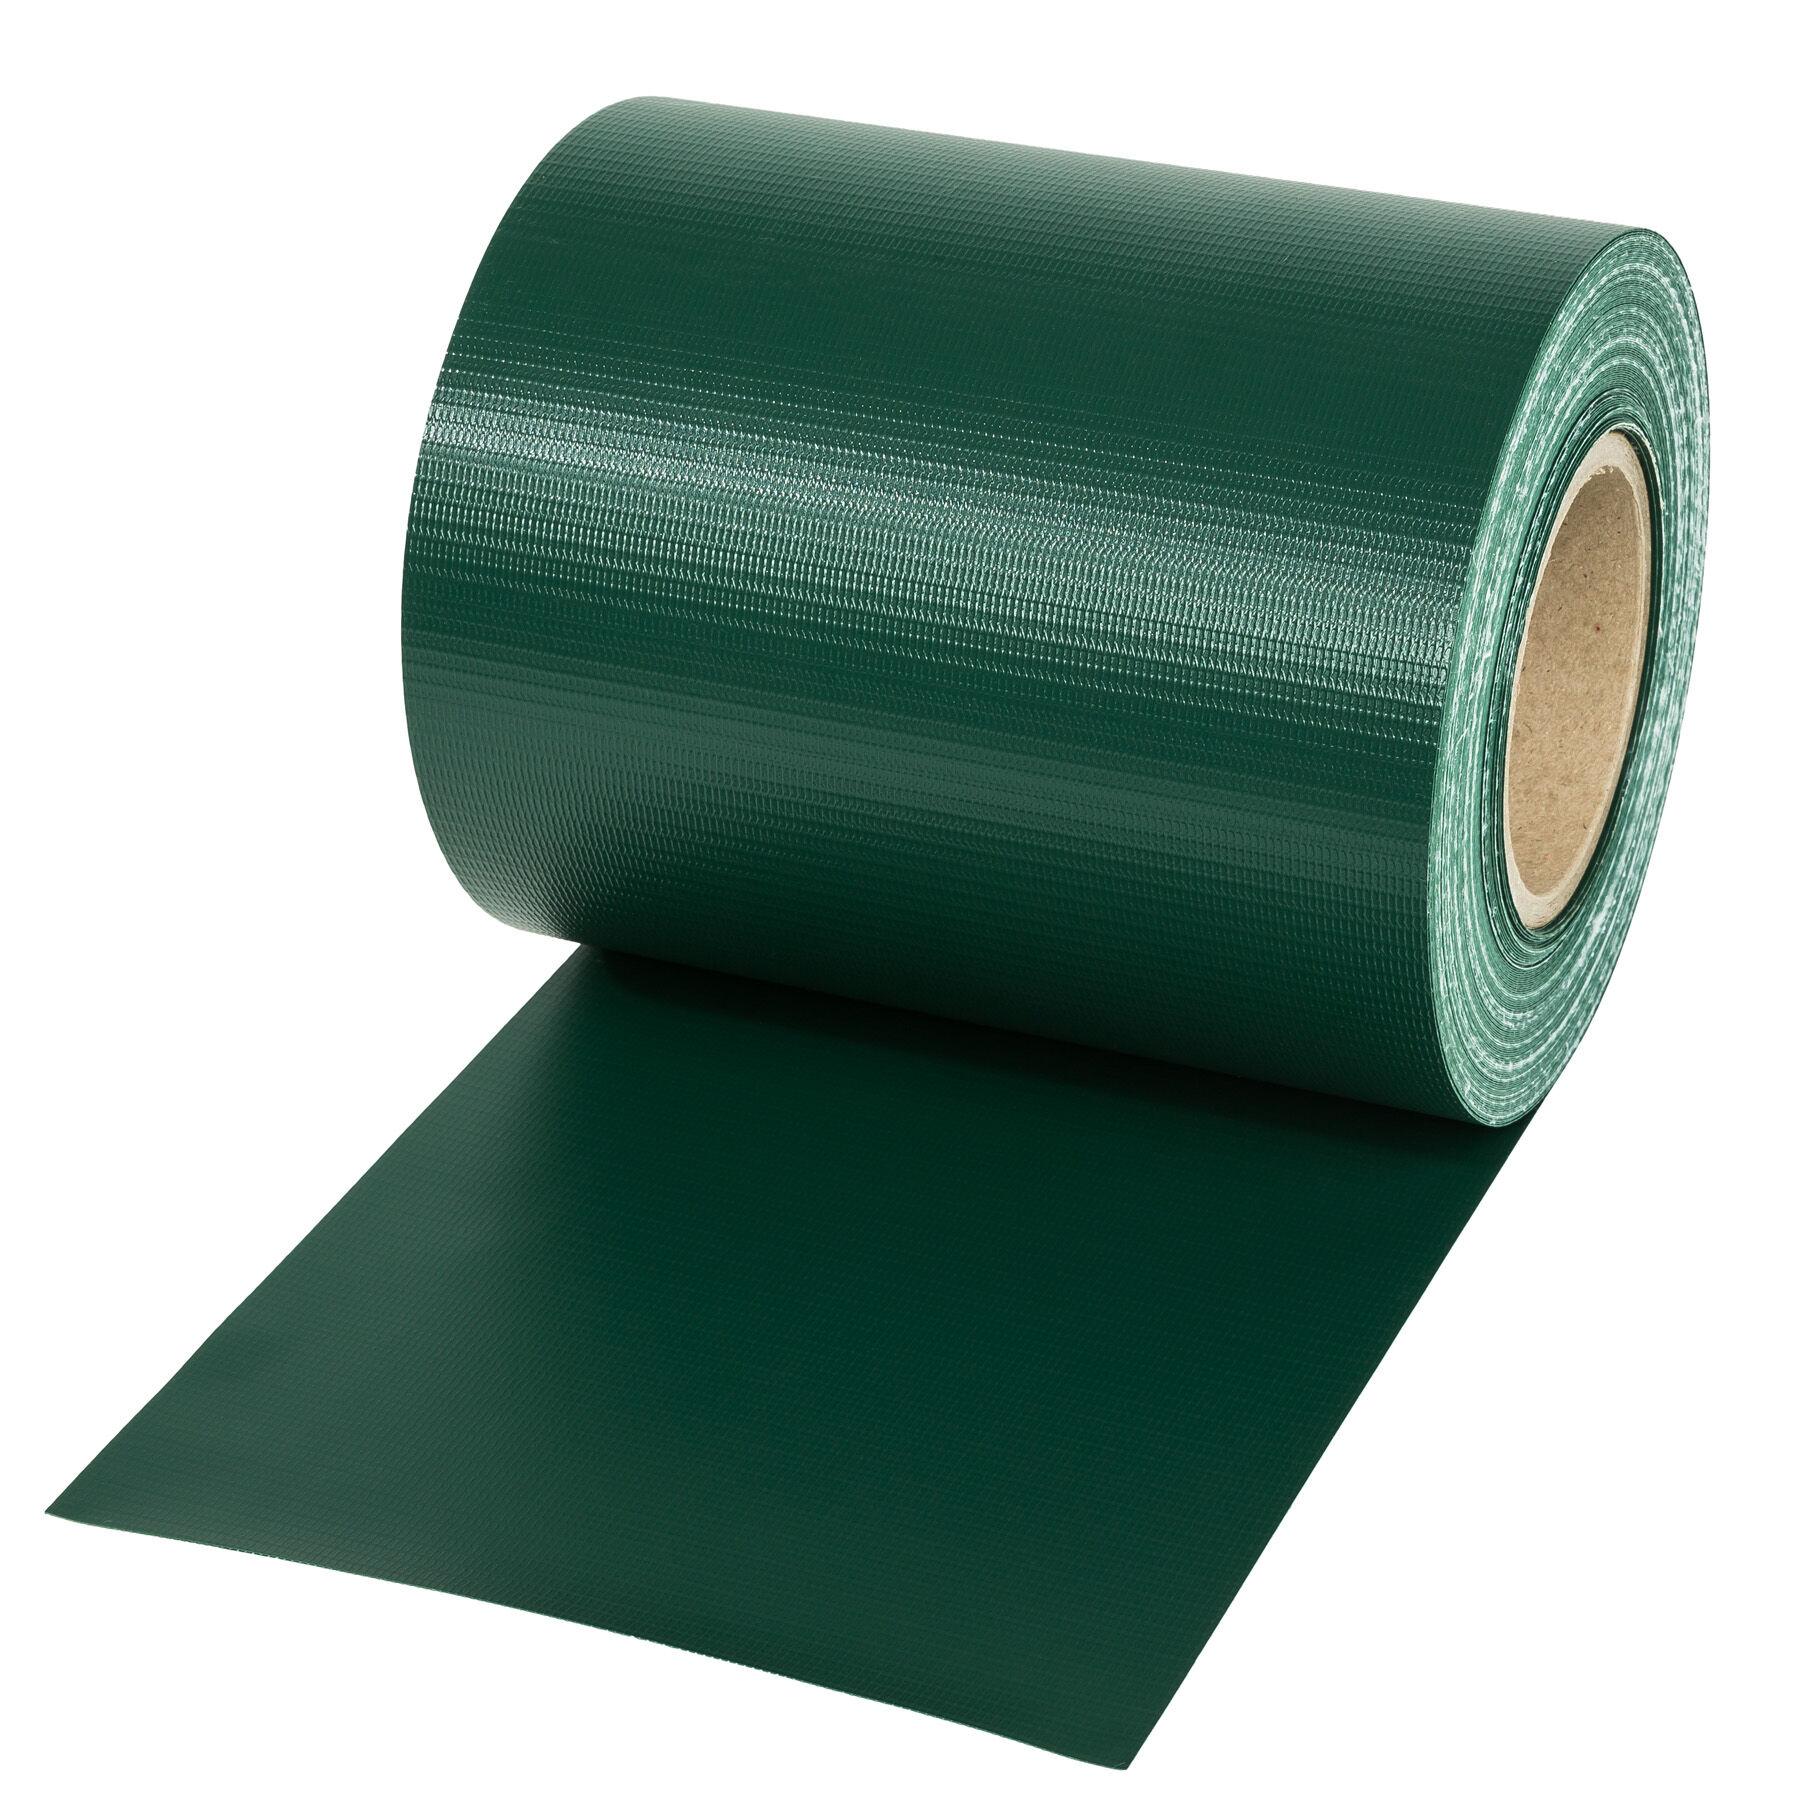 tectake frangivista in PVC - verde, 35 m